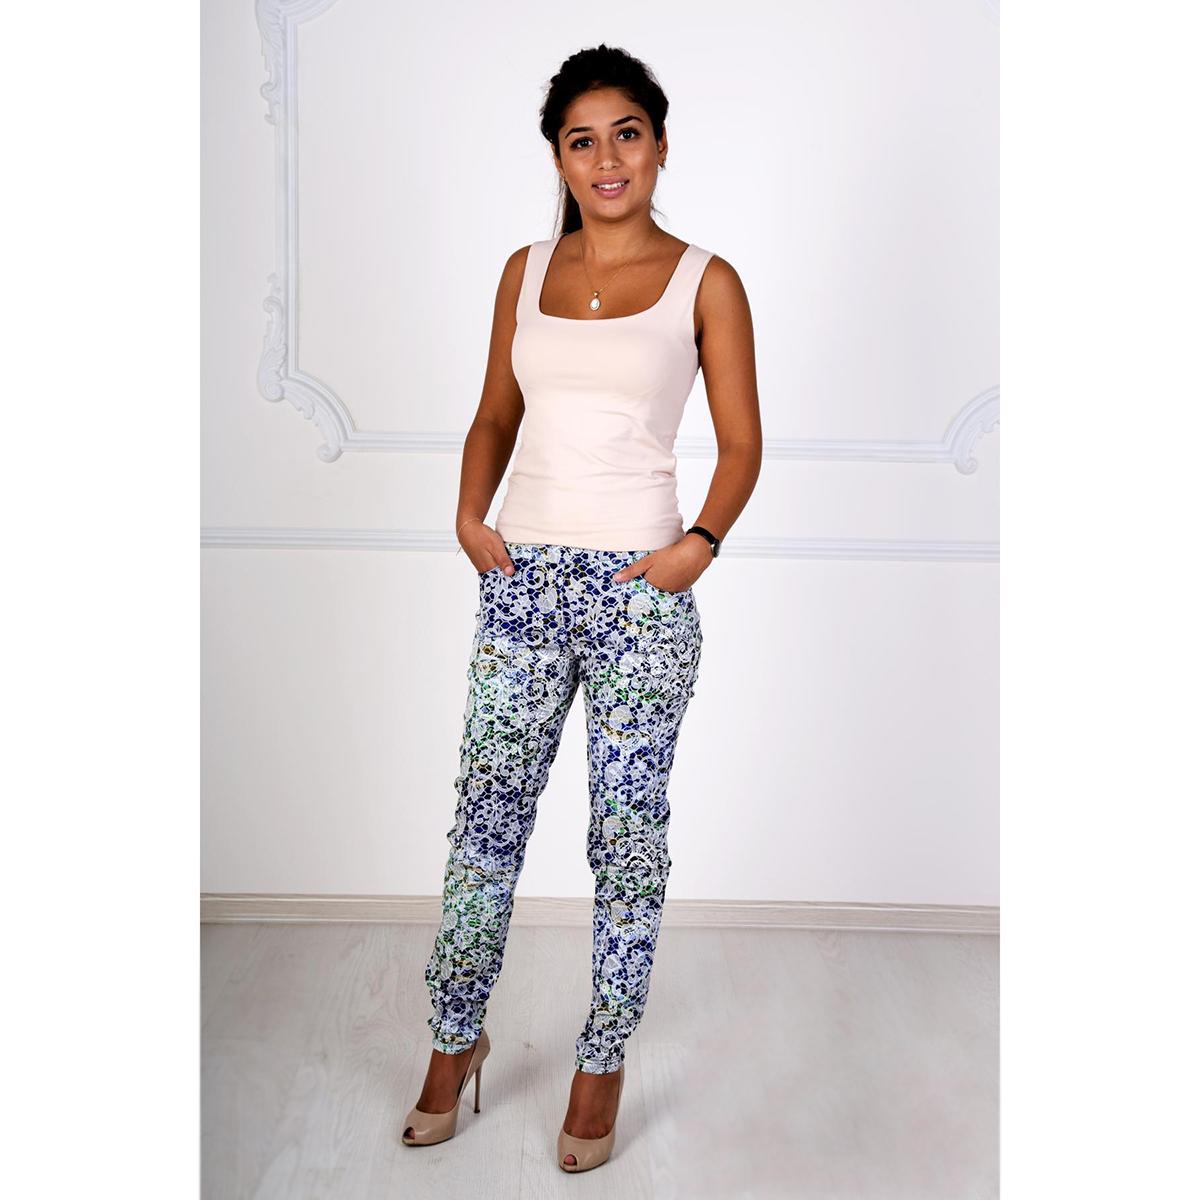 Женские брюки Жаккард арт. 0153, размер 52Брюки<br>Обхват талии:85 см<br>Обхват бедер:112 см<br>Рост:167 см<br><br>Тип: Жен. брюки<br>Размер: 52<br>Материал: Жаккард